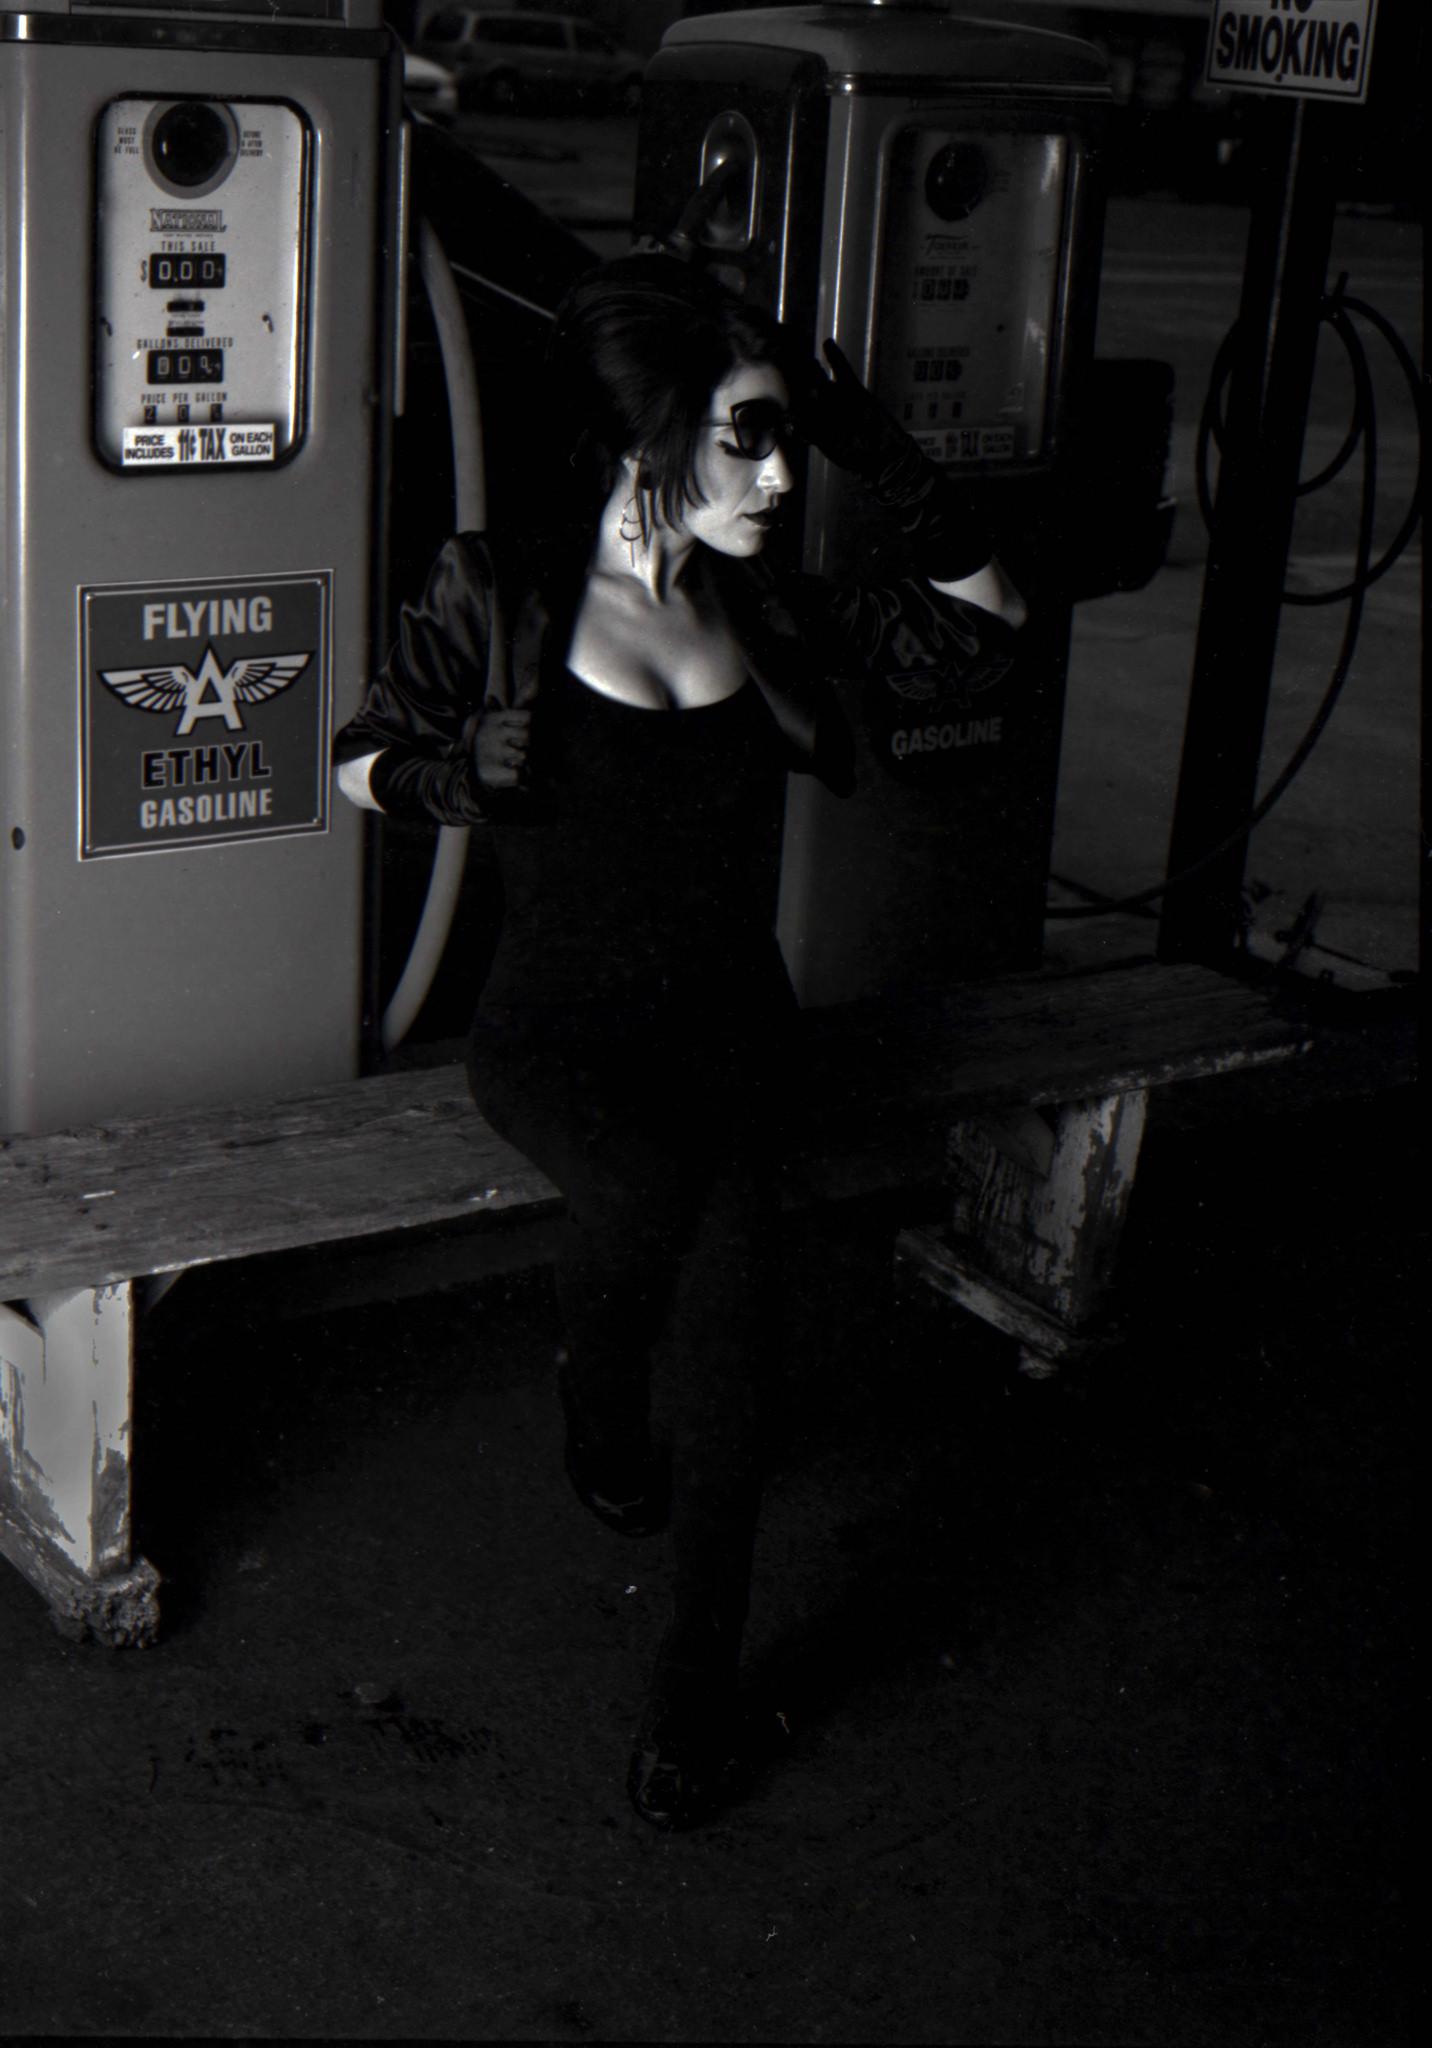 Petrol Noir - Ilford PanF